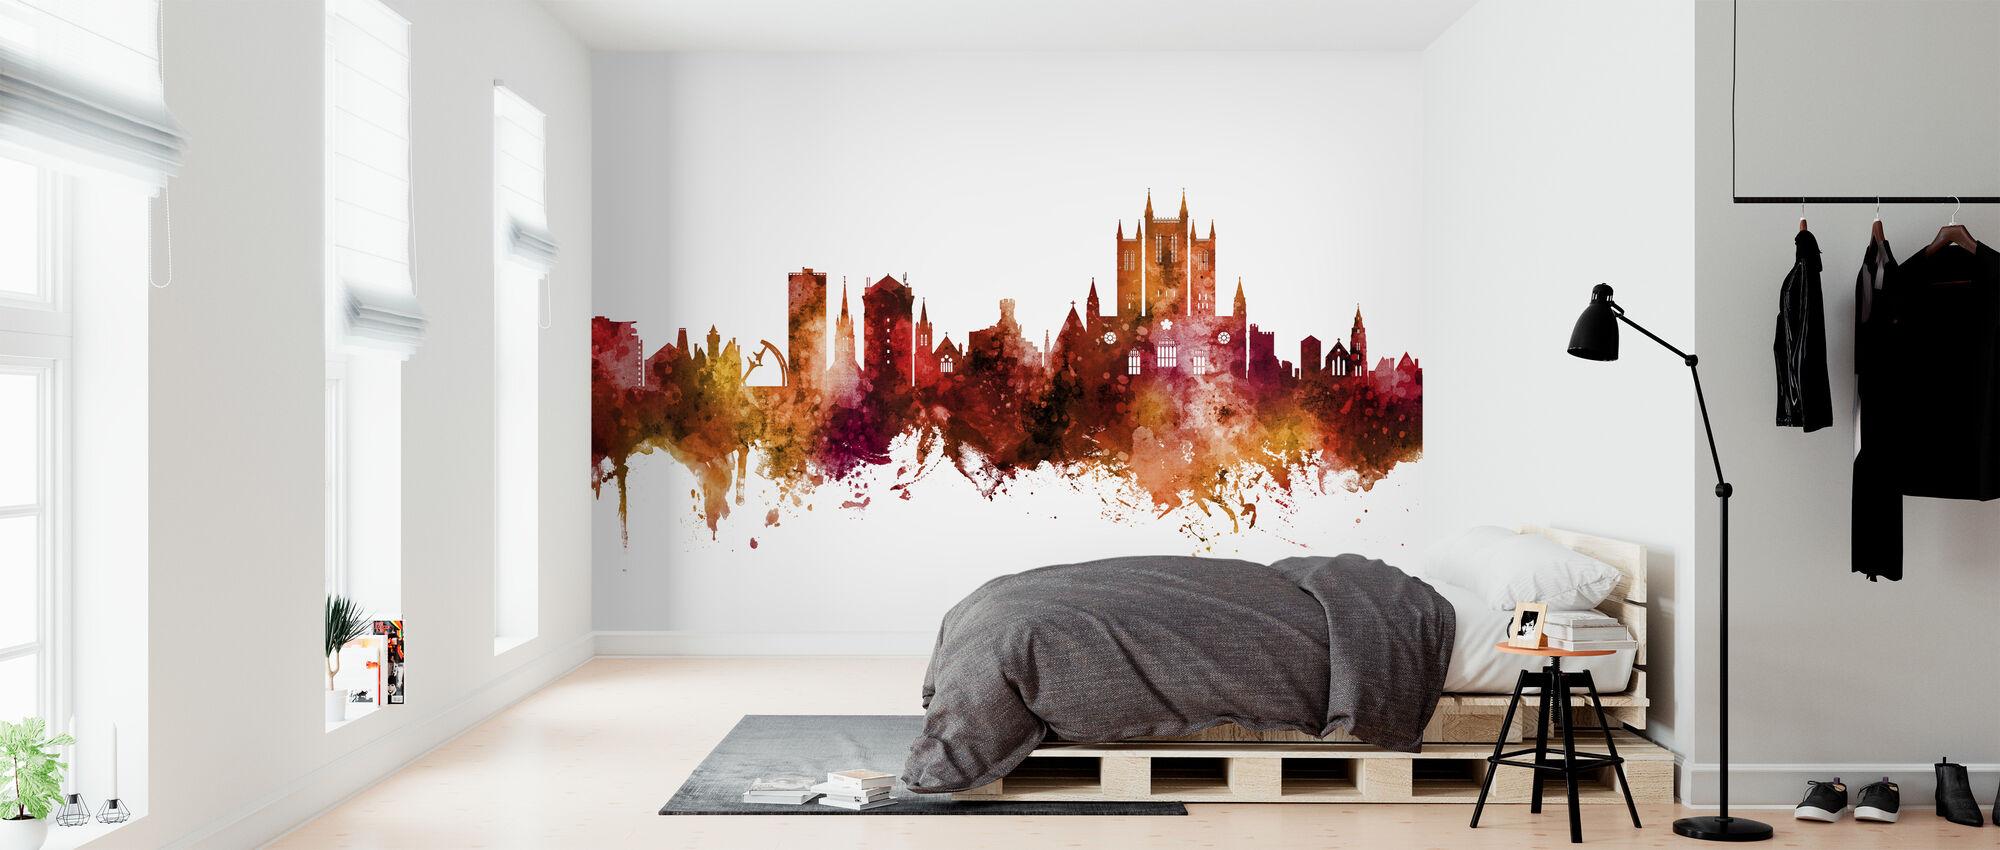 Lincoln England Skyline - Wallpaper - Bedroom